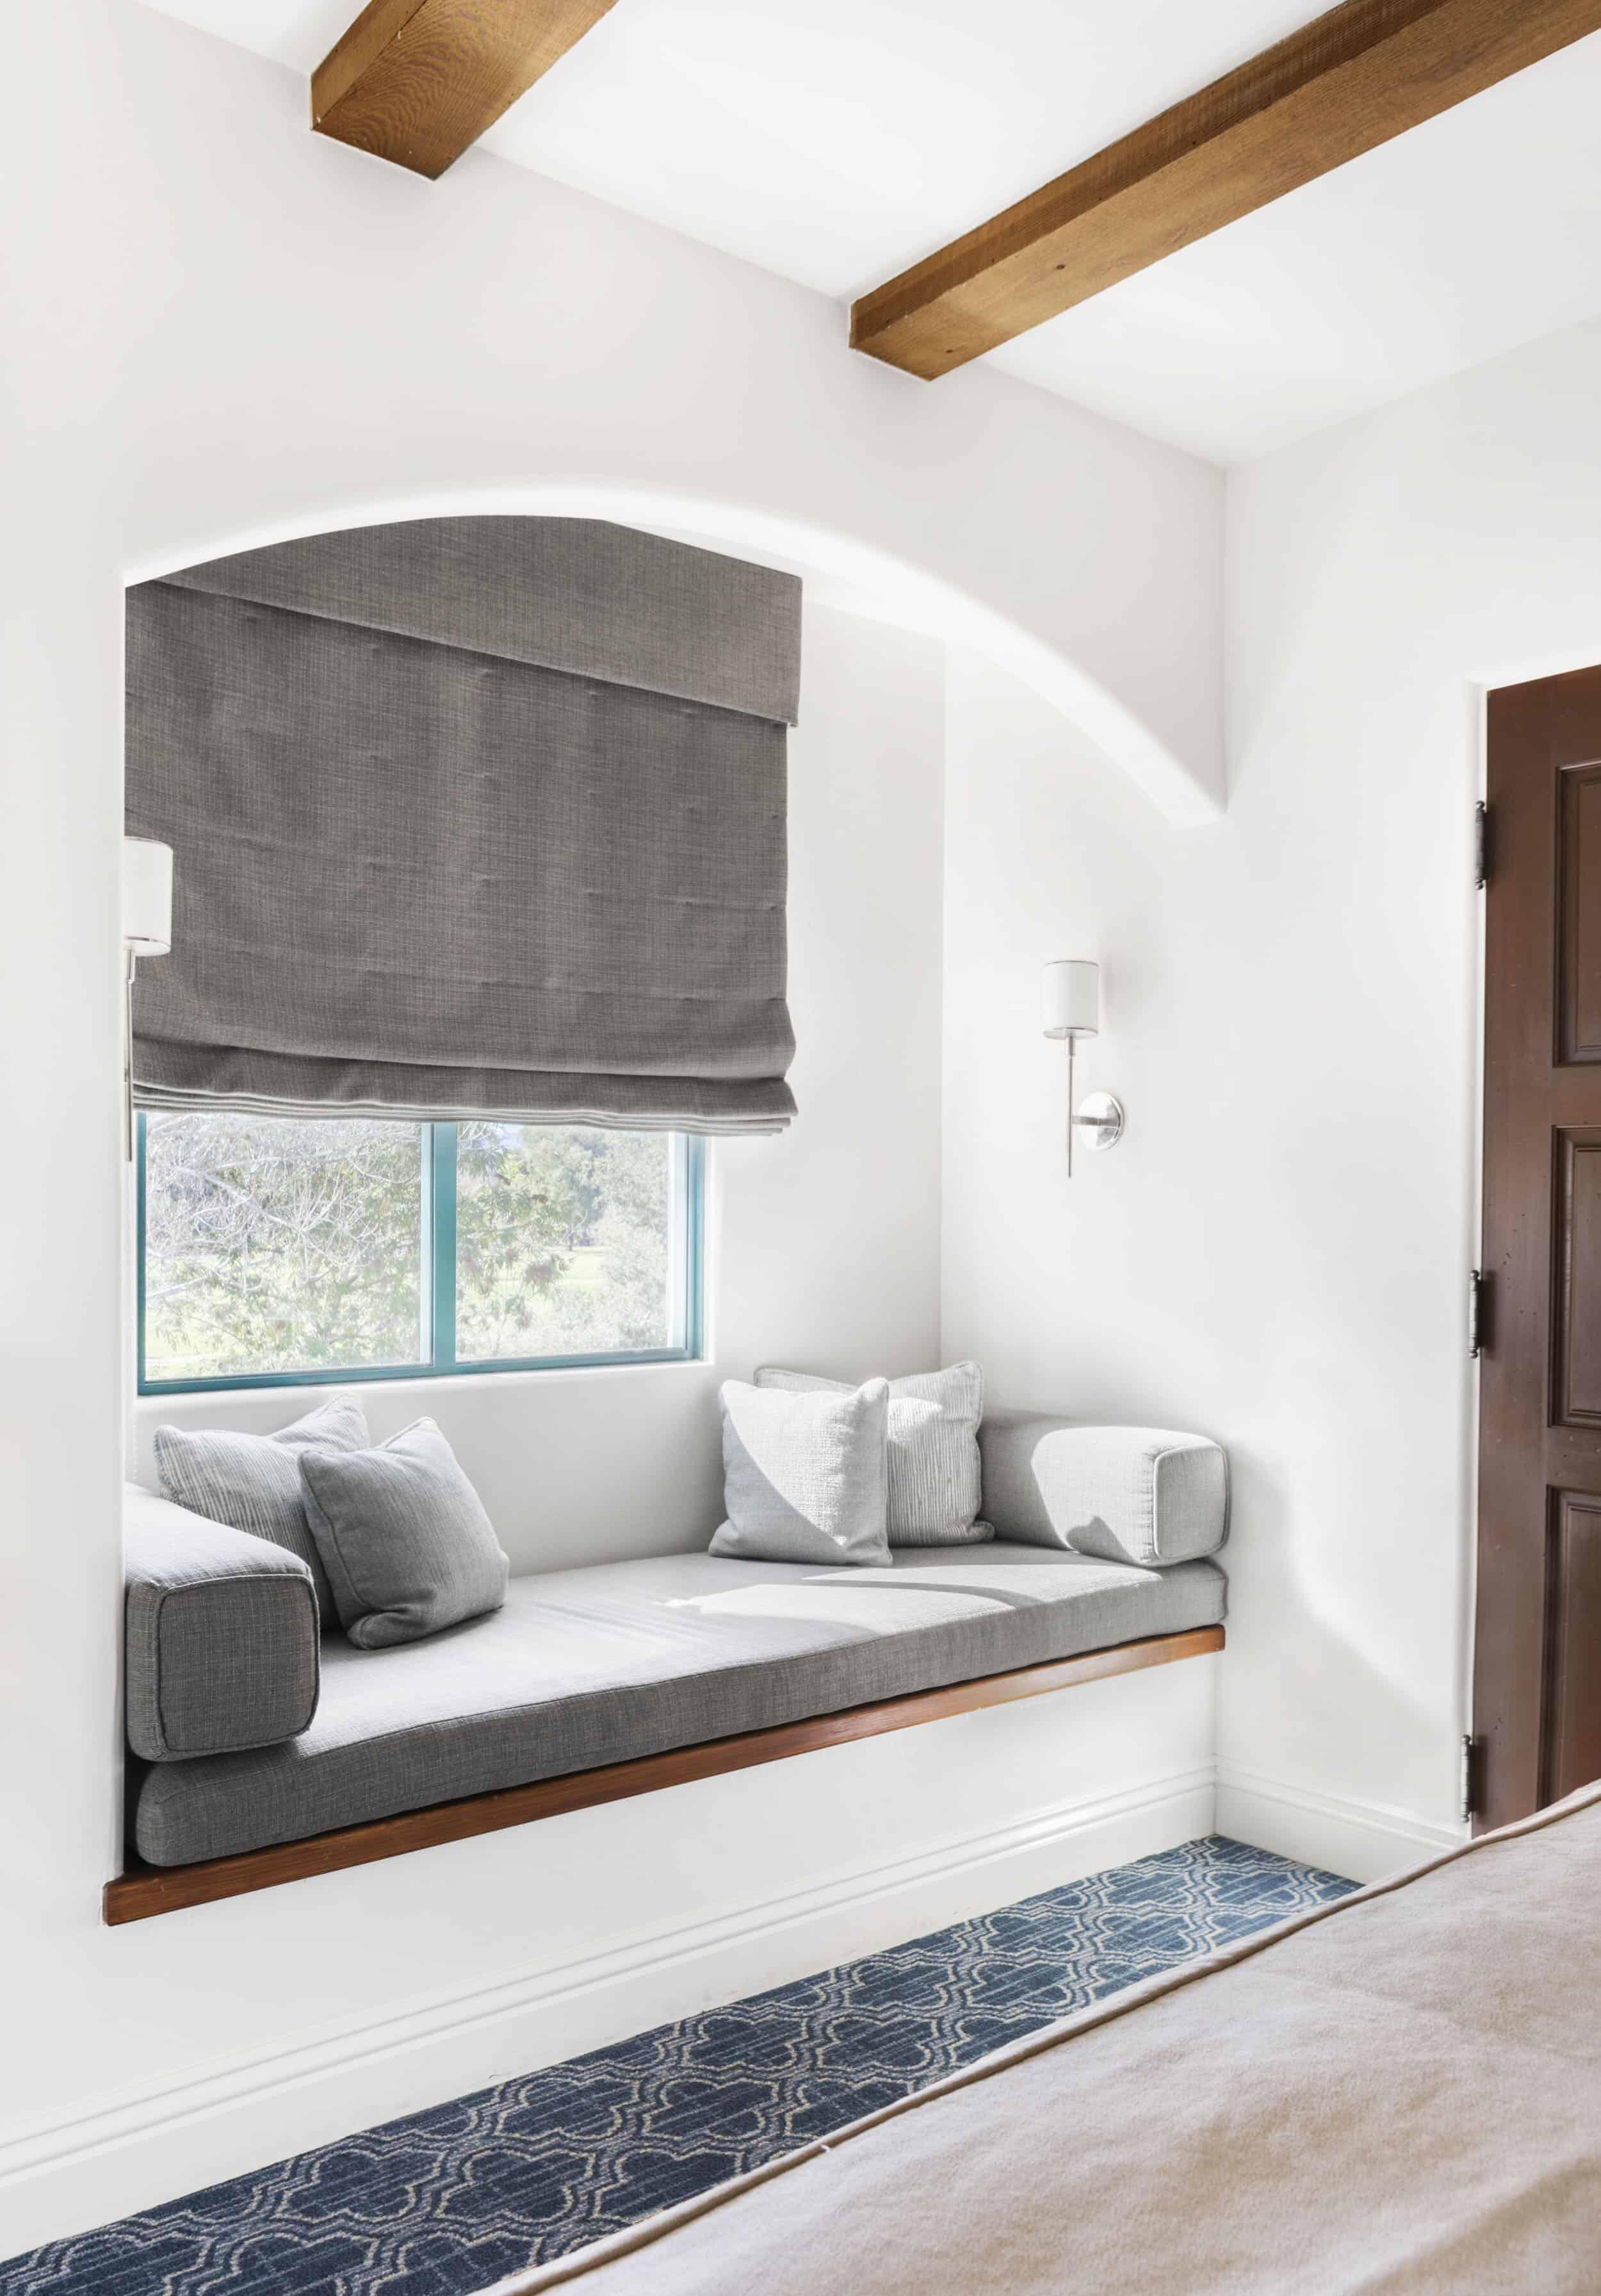 Resort Ojai Valley Rooms Upholstered Window Bench